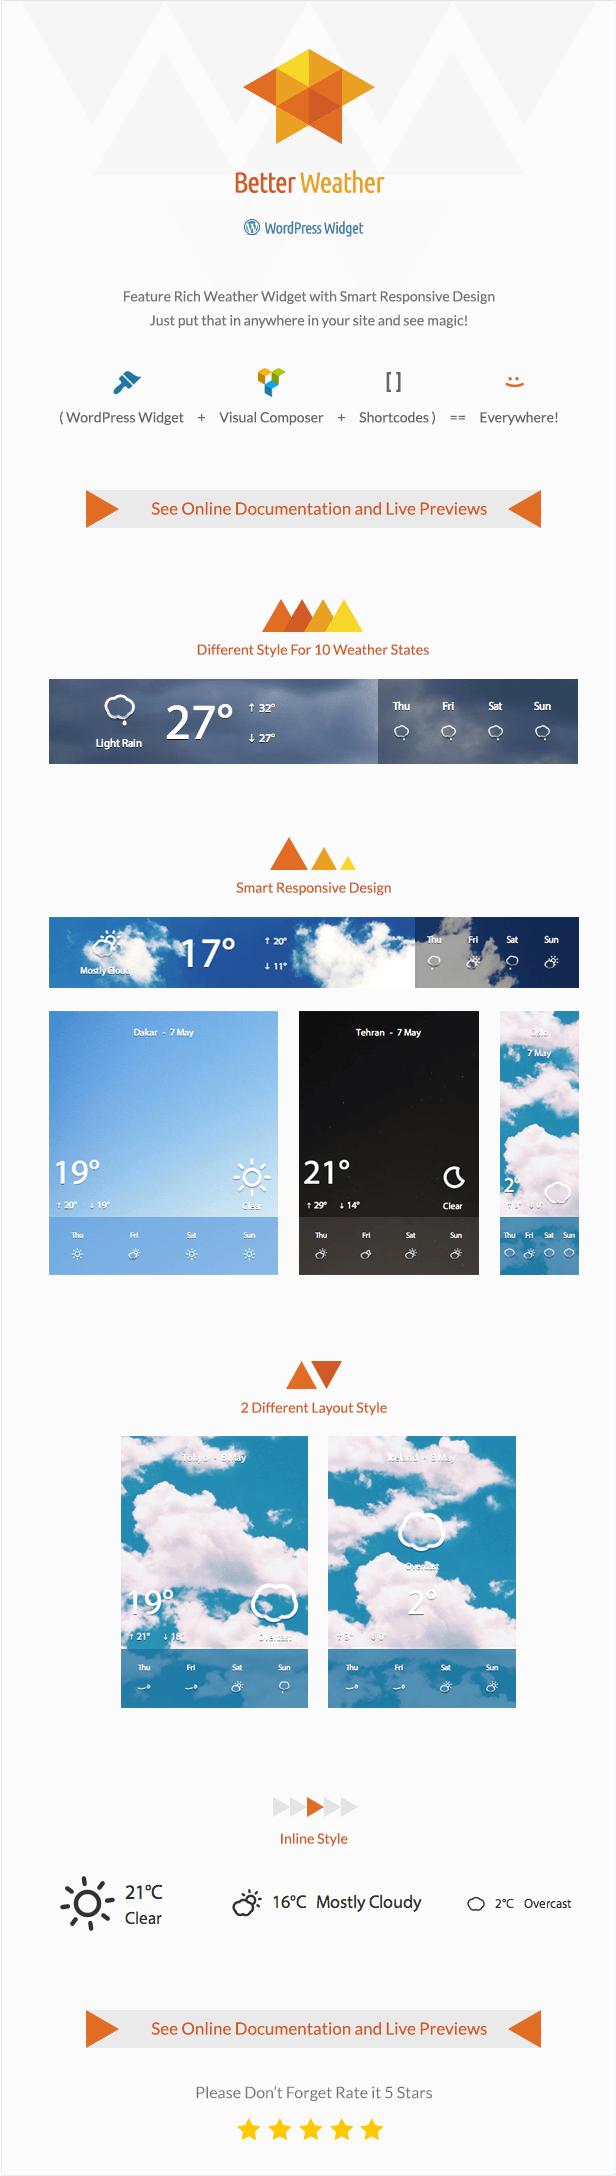 Better Weather - WordPress and Visual Composer Widget 4